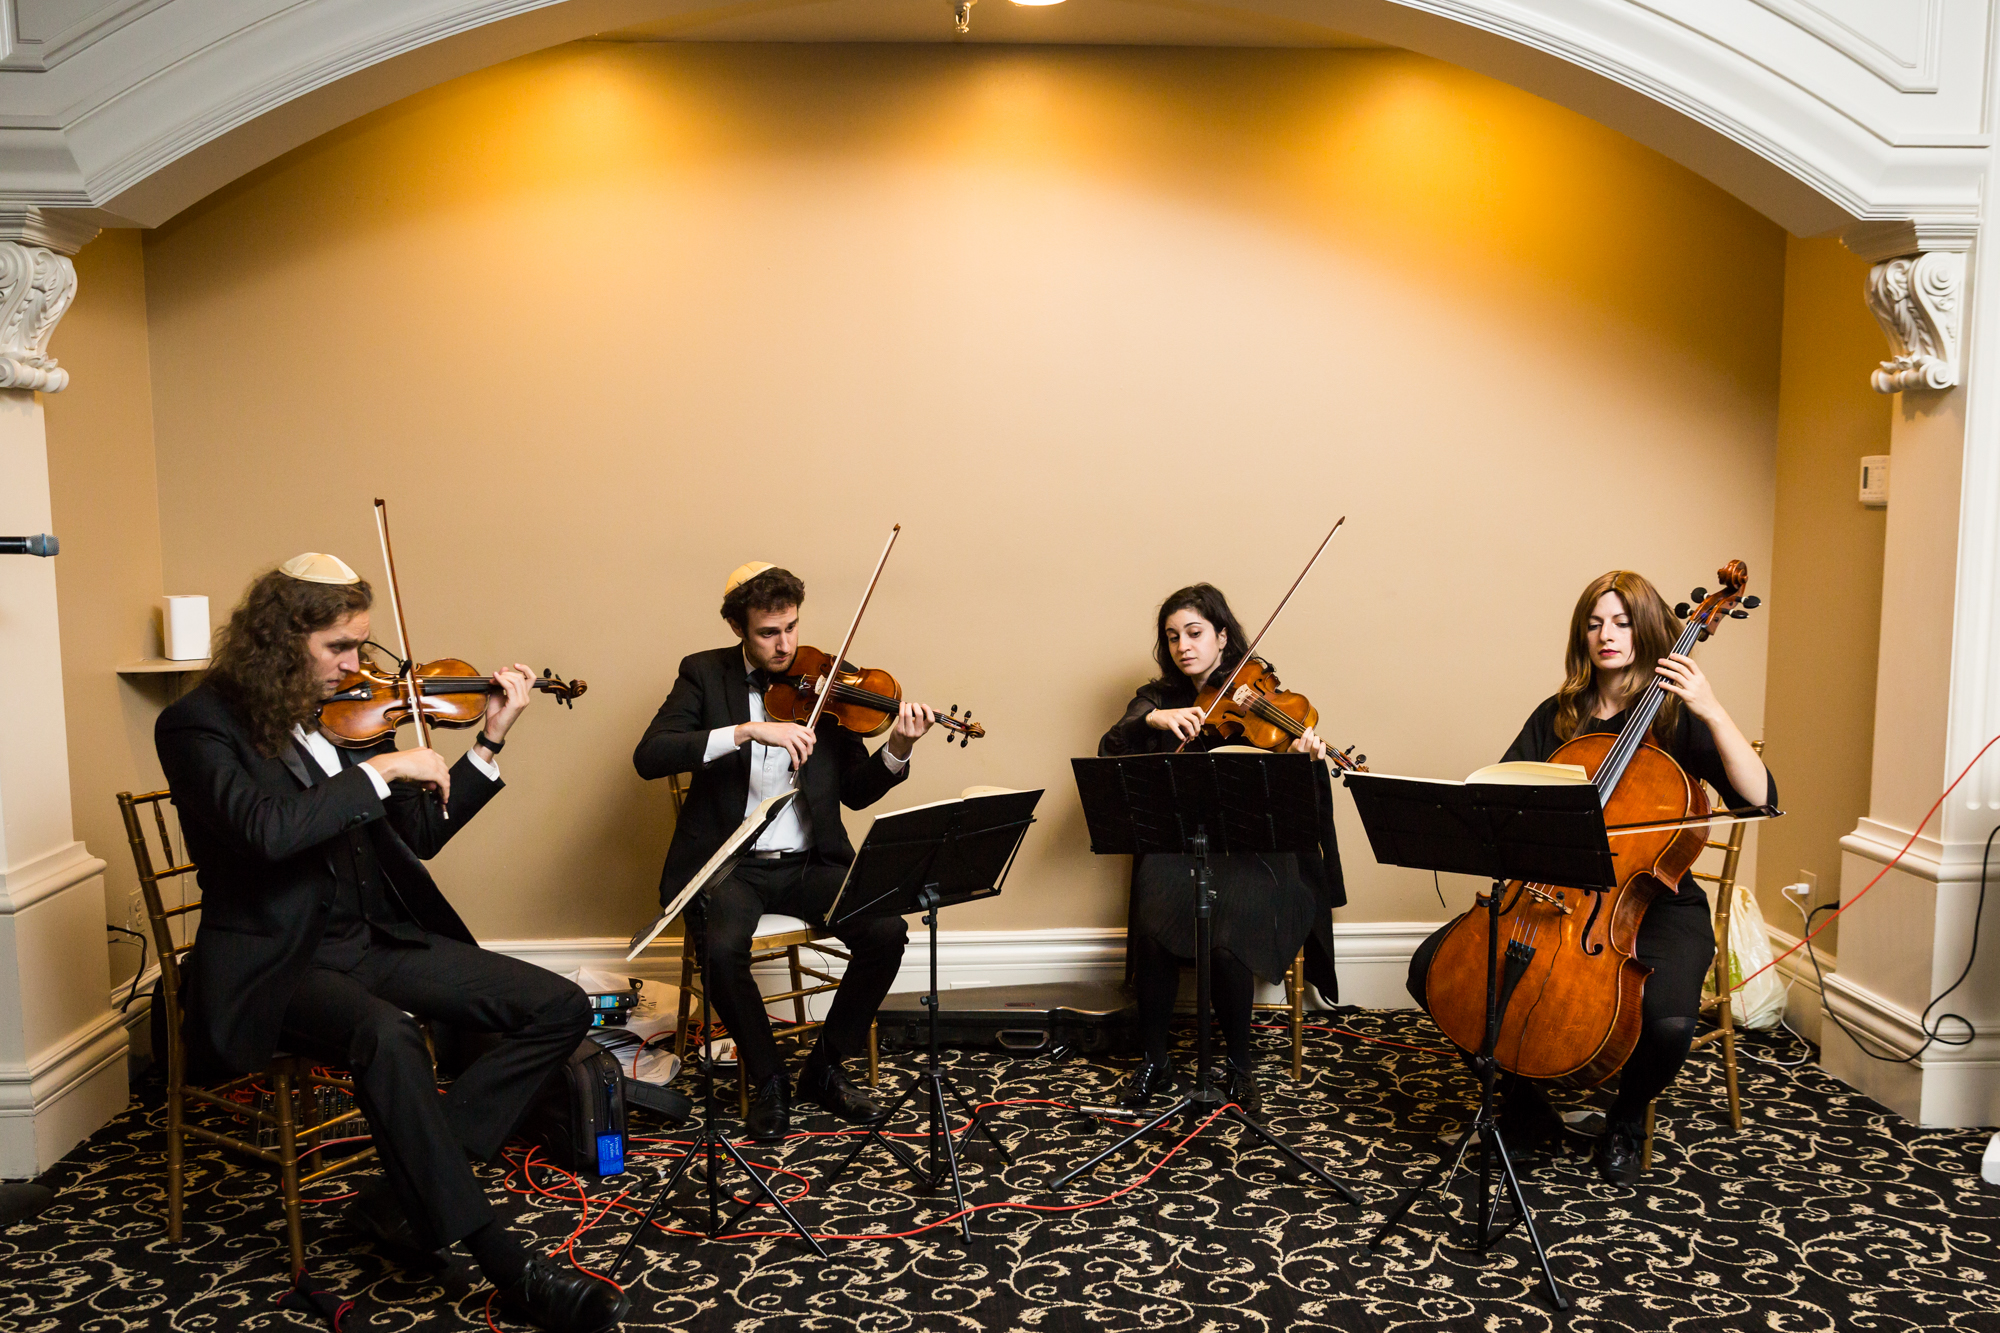 String quartet for an article on band vs DJ